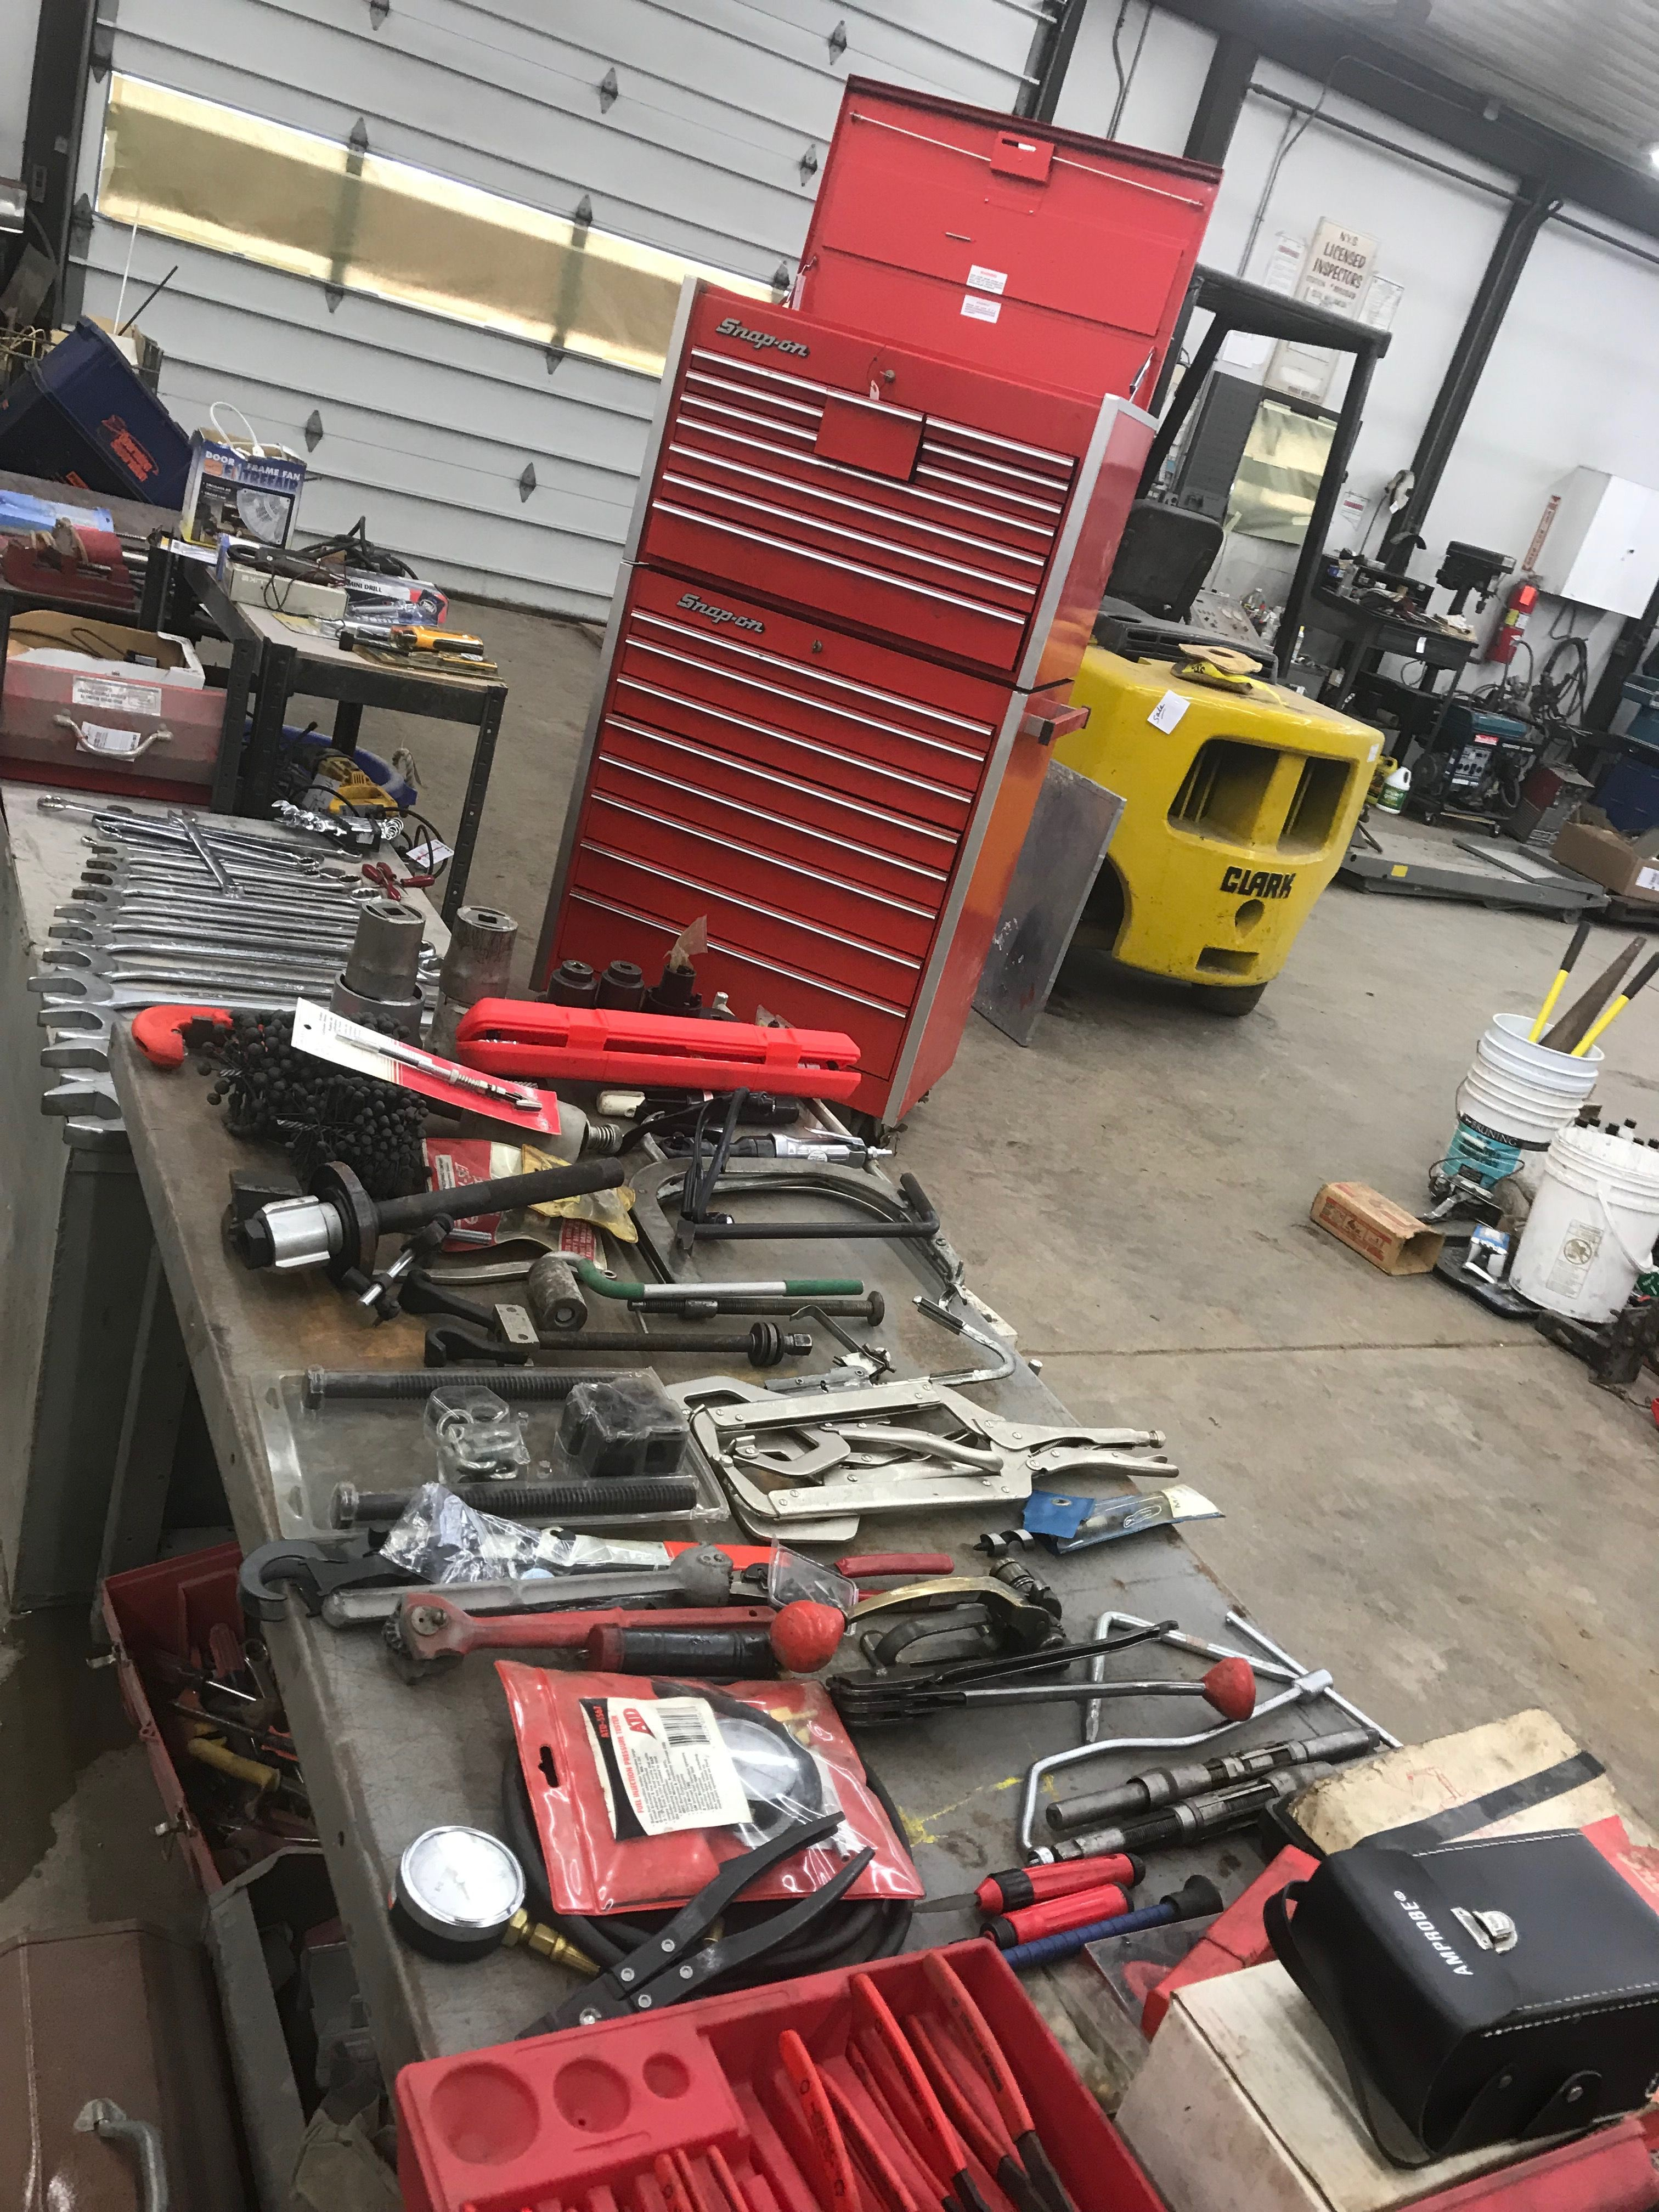 Chucks Cars Garage Equipment Auction Chucksautobodyestateauction Classic Car Restoration Auto Body Shop Car Restoration